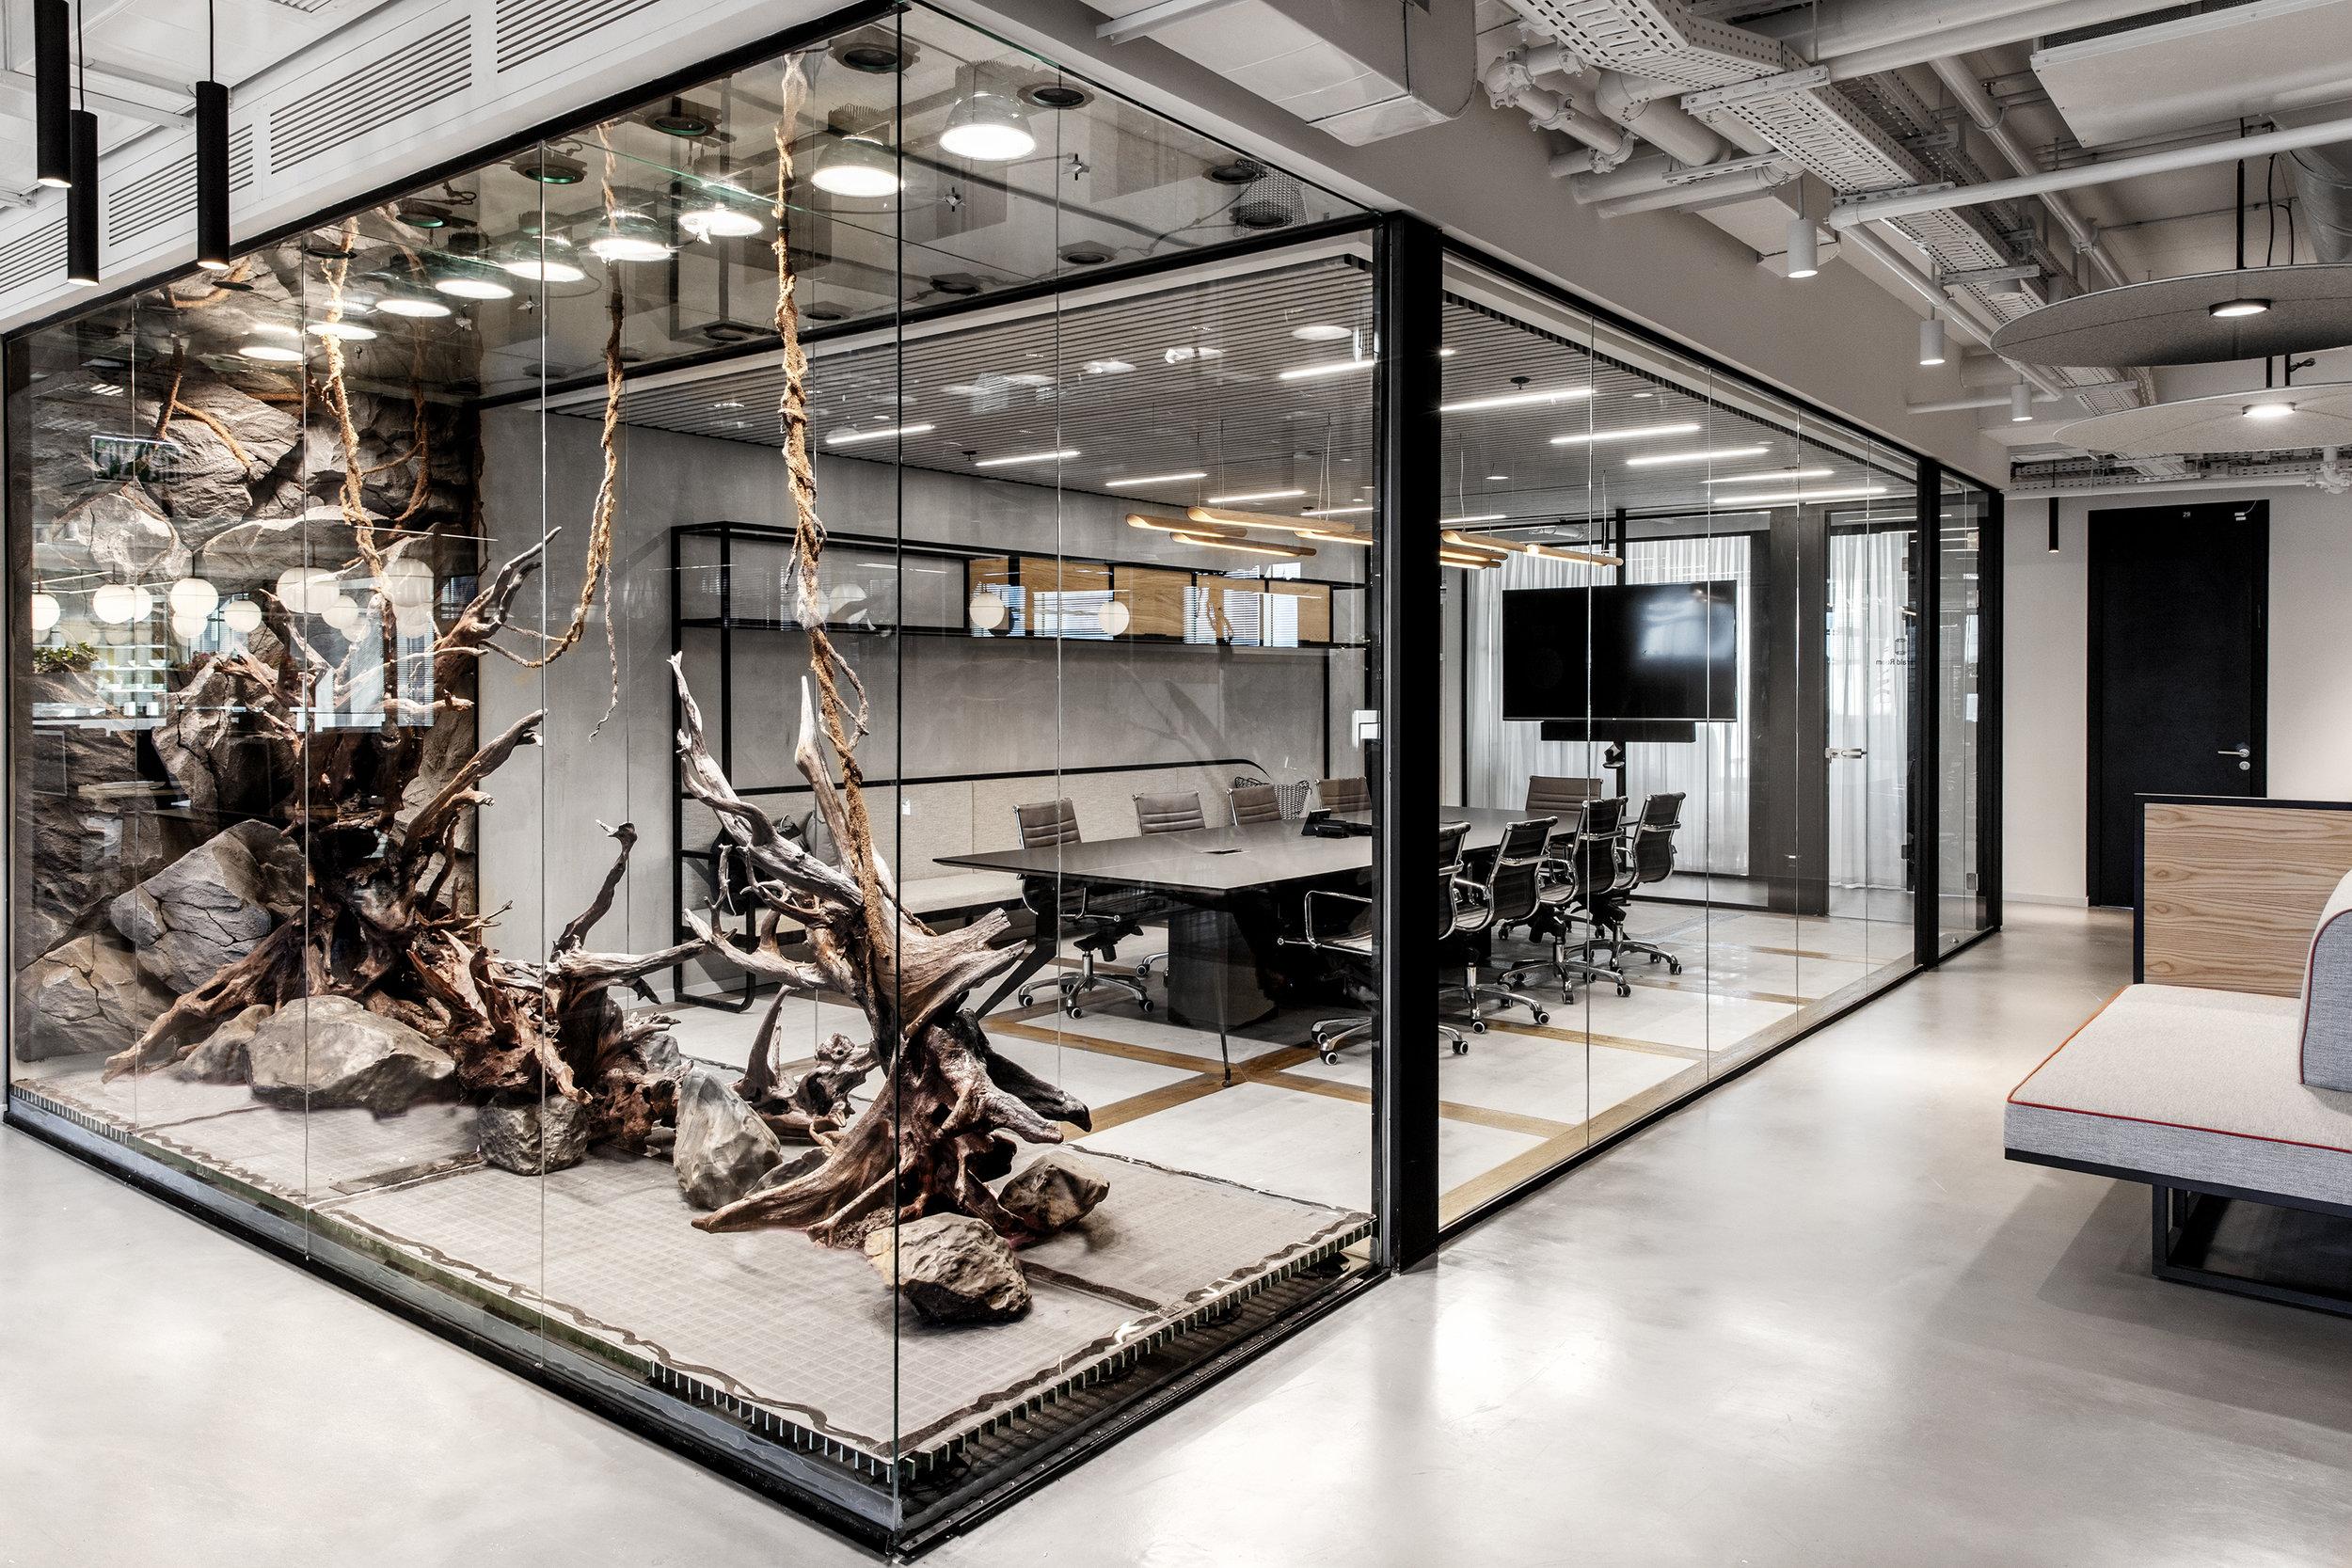 R2NET OFFICES - ROY DAVID ARCHITECTURE  STUDIO - רואי דוד אדריכלות סטודיו אדריכלים - אר2נט (46).jpg